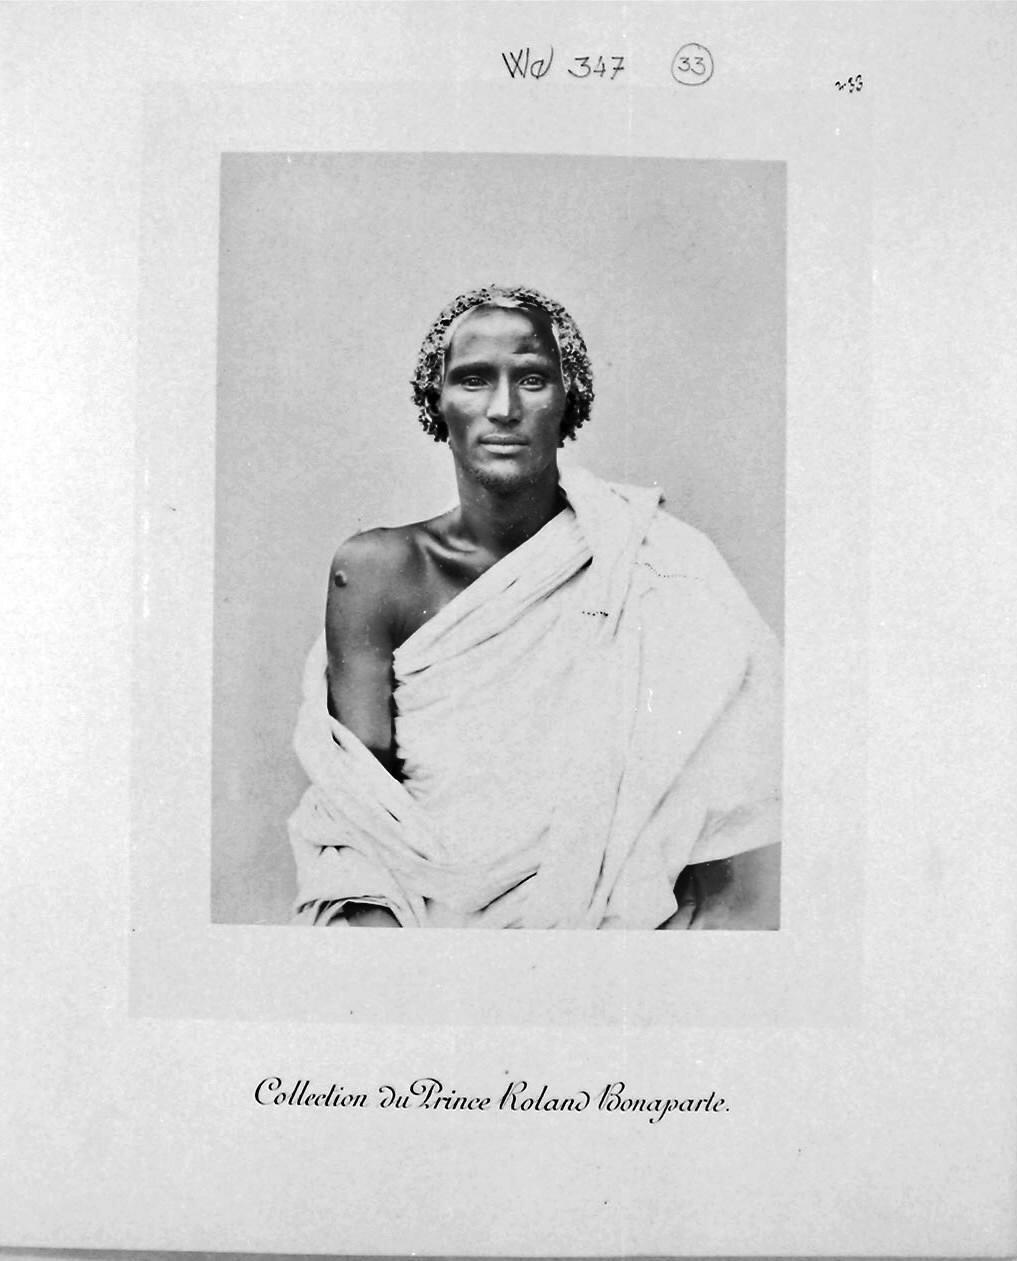 Бечри Обахли, племя Хабар-аваль, 26 лет